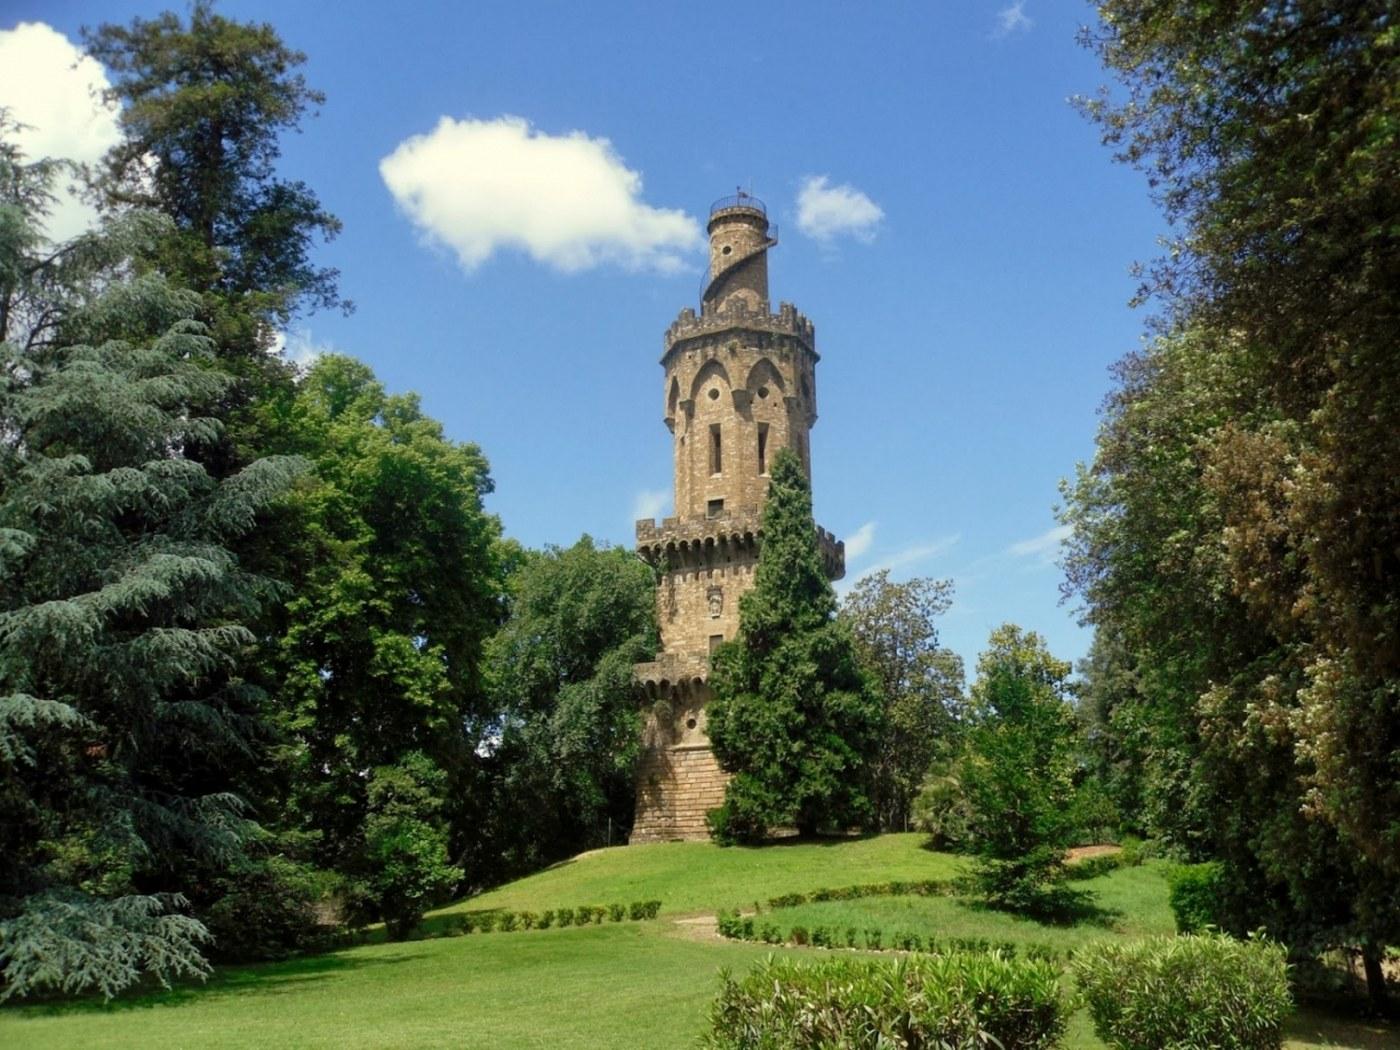 Torrigiani tower